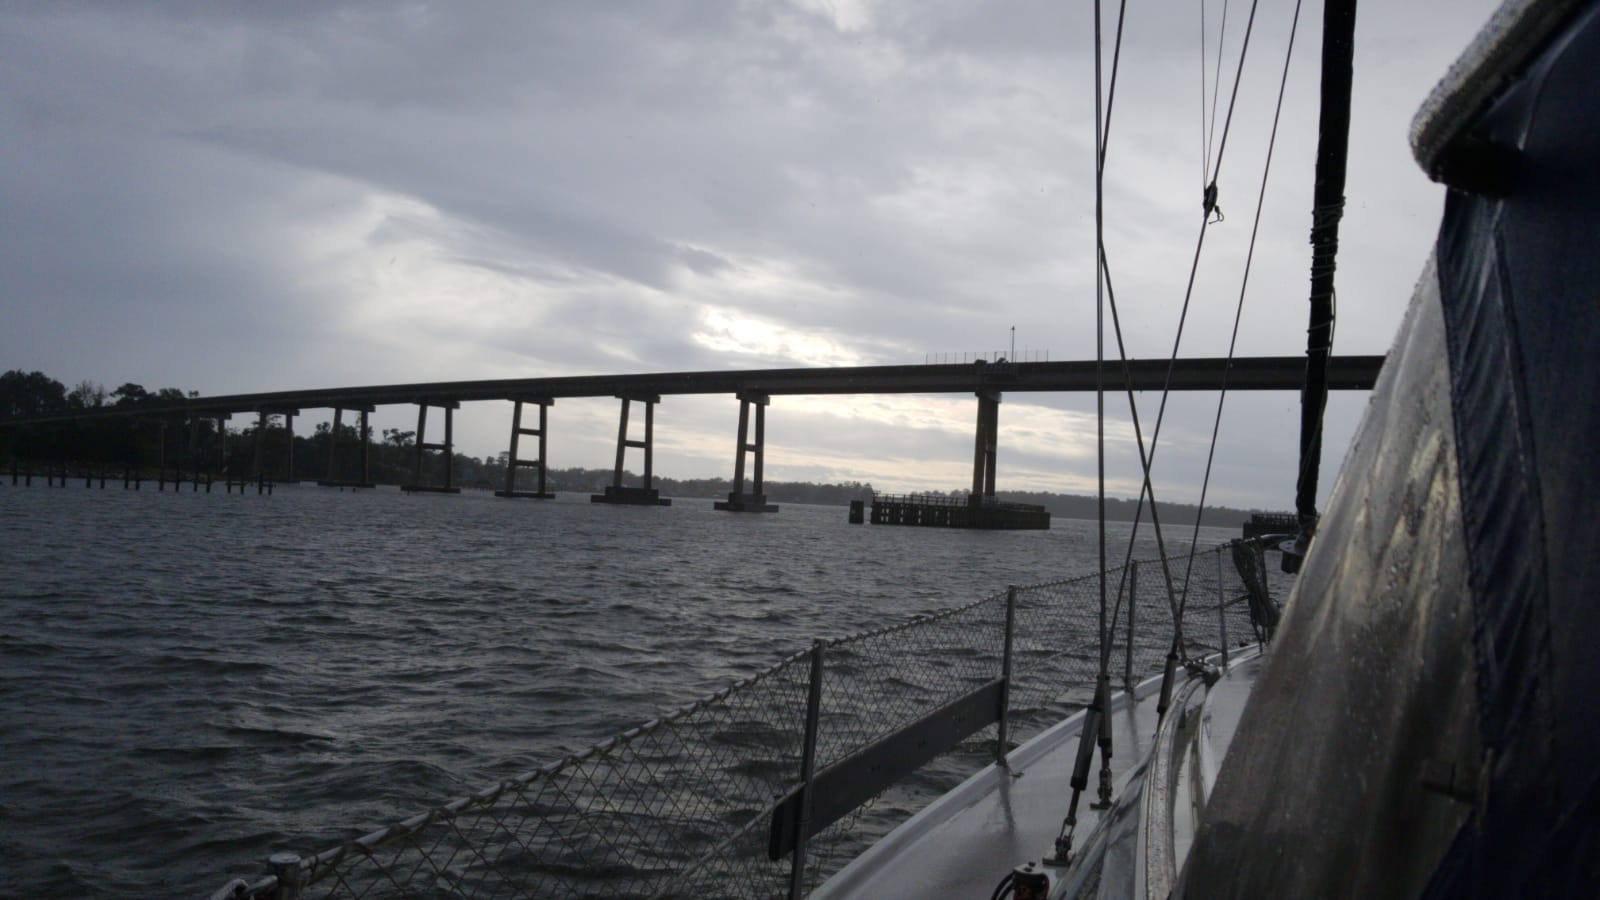 sneadsferrybridge